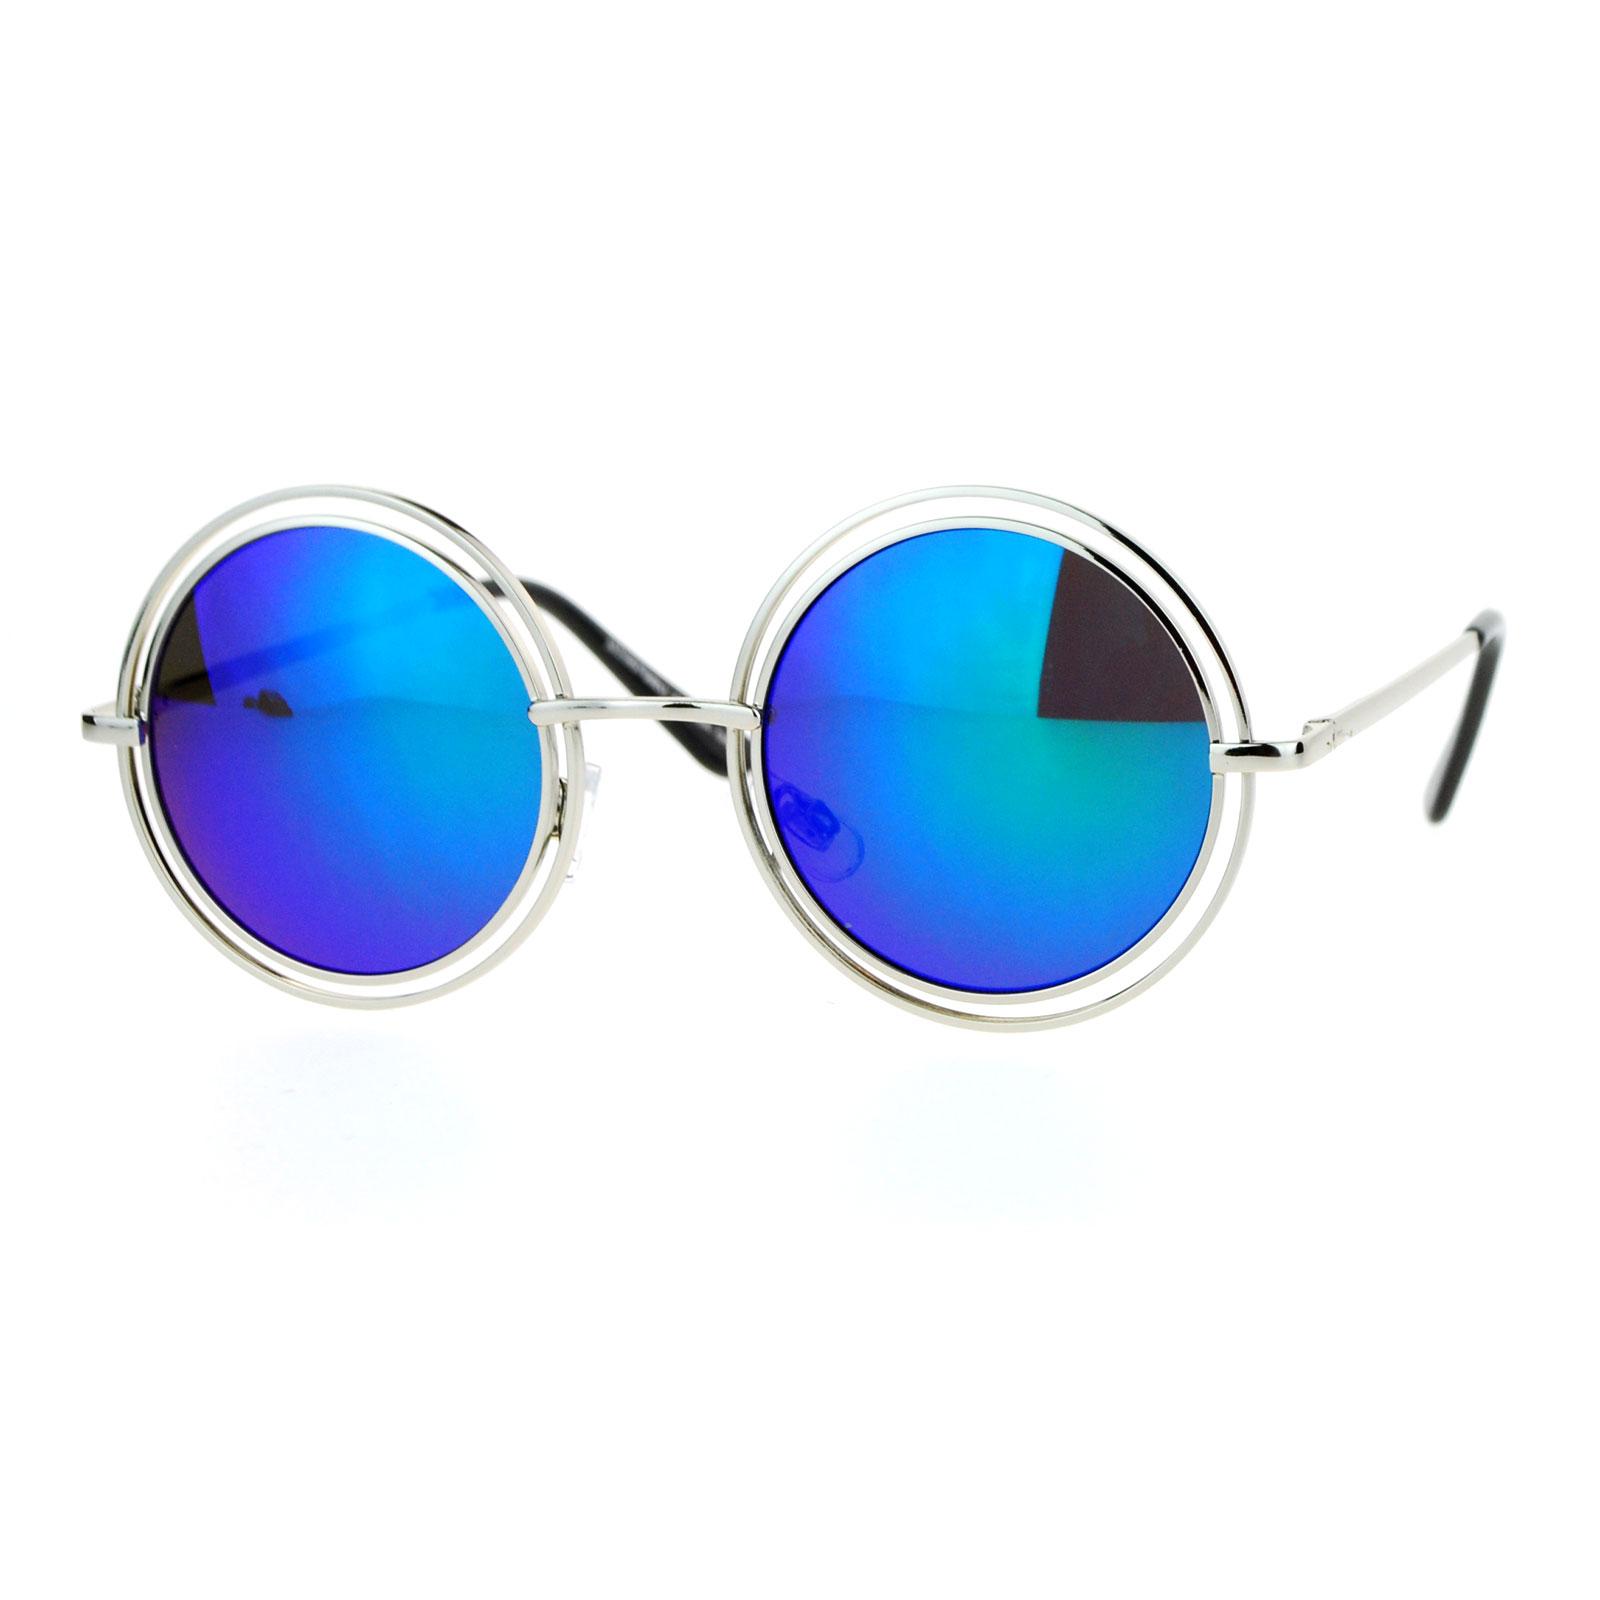 Circle Lens Sunglasses  sa106 uni double frame hippie round circle lens pimp sunglasses